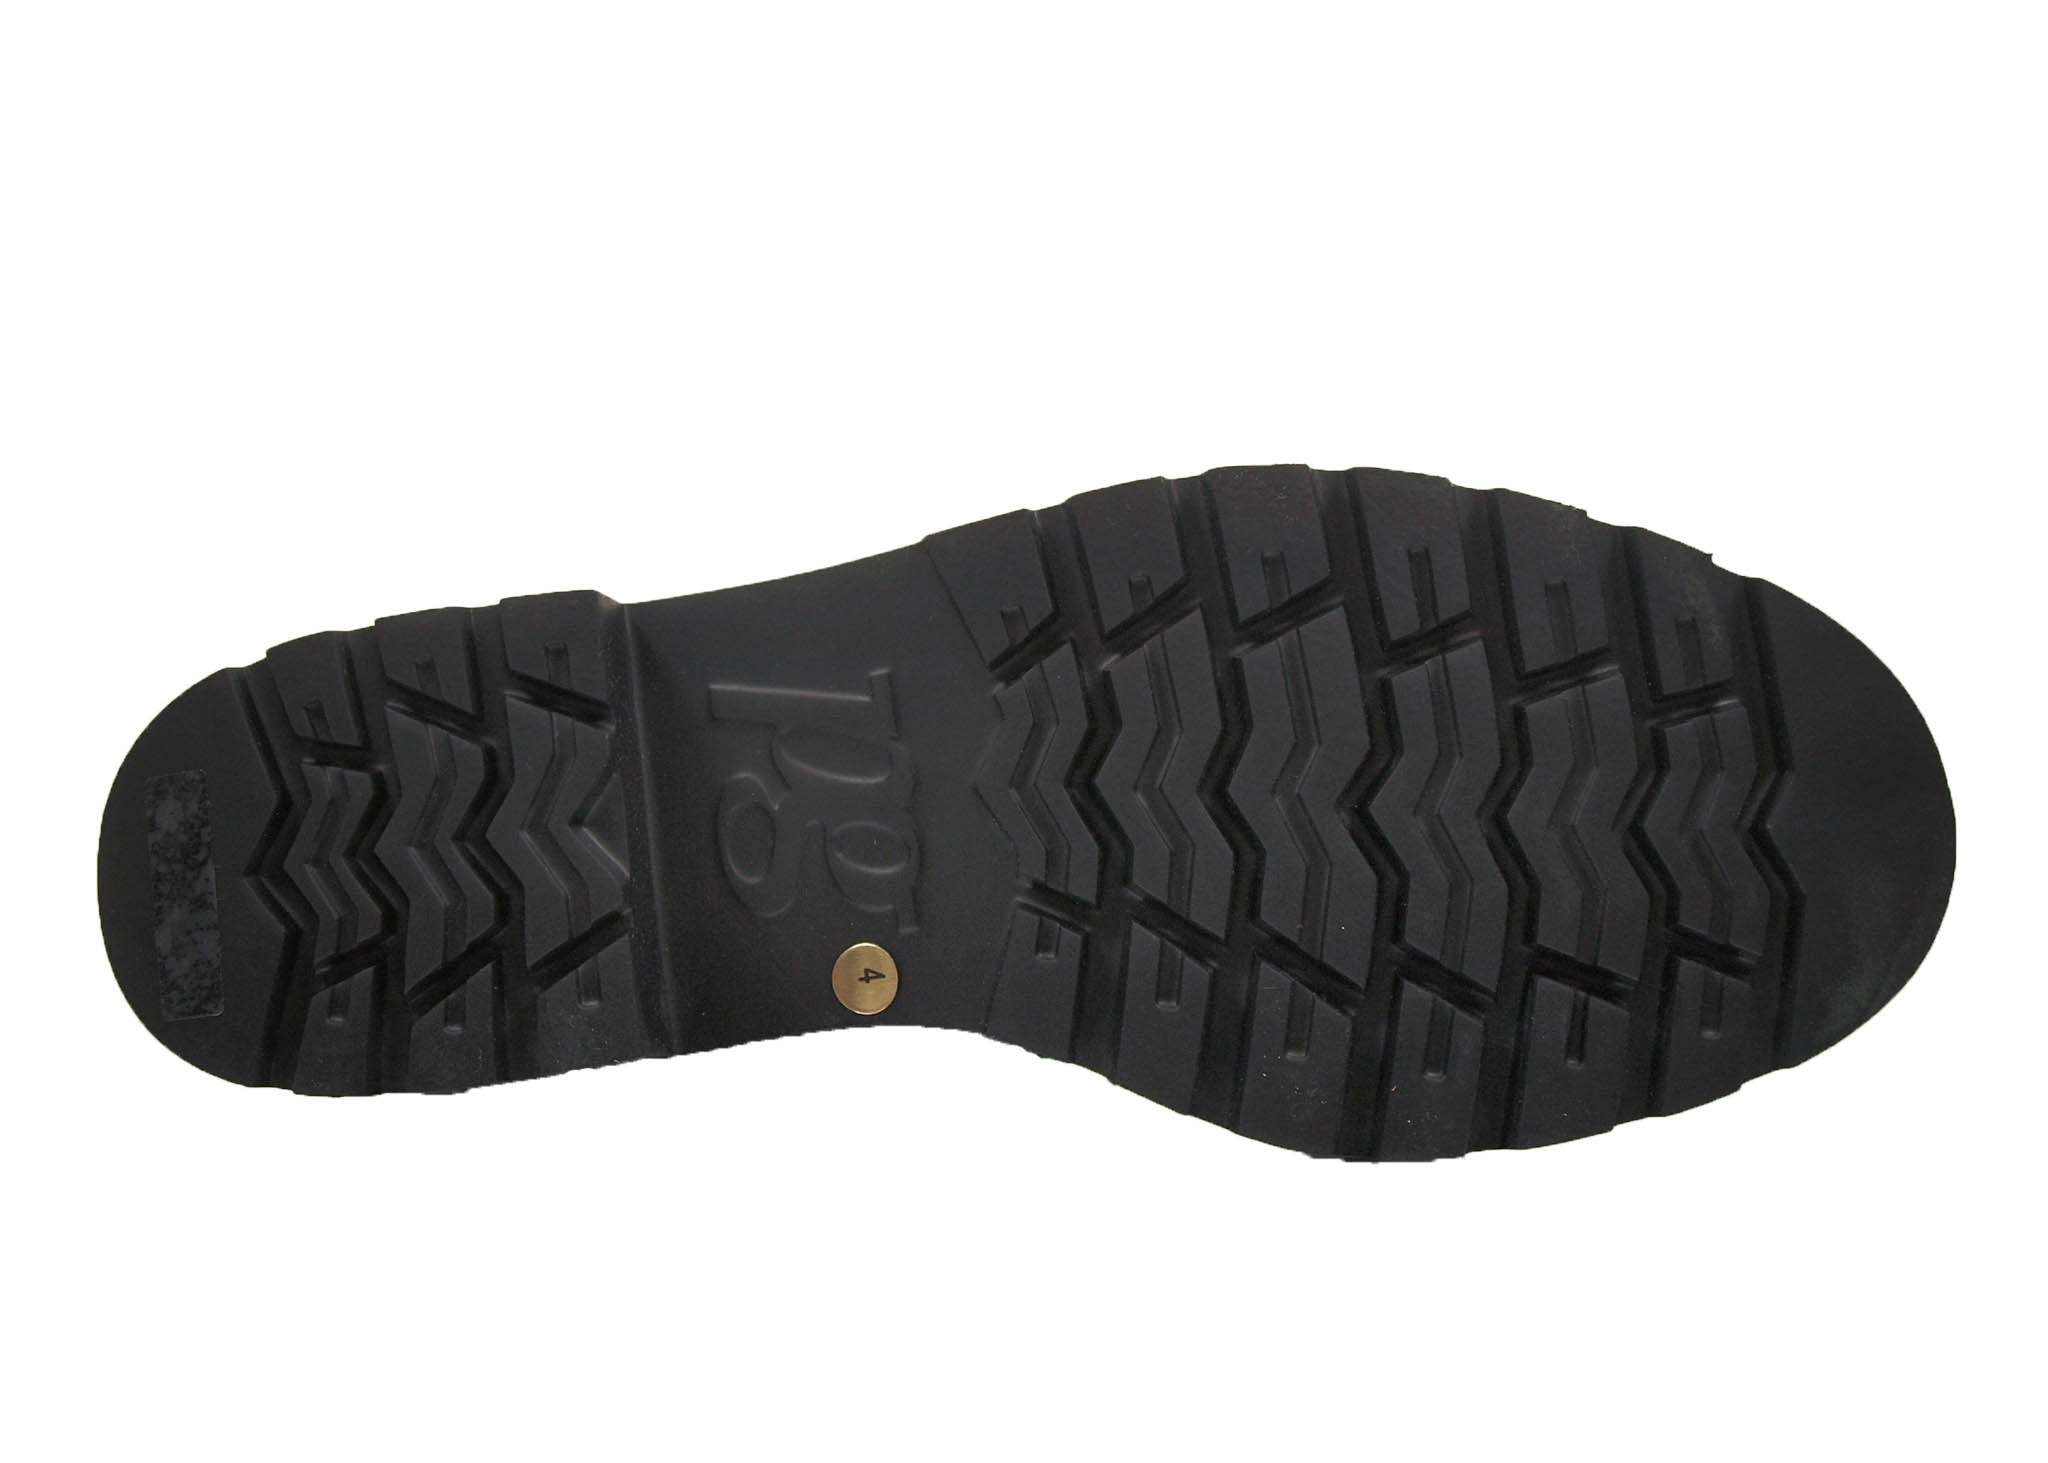 Paul Green Paul Green Chelsea Boots 9925-039 Zwart Lakleer